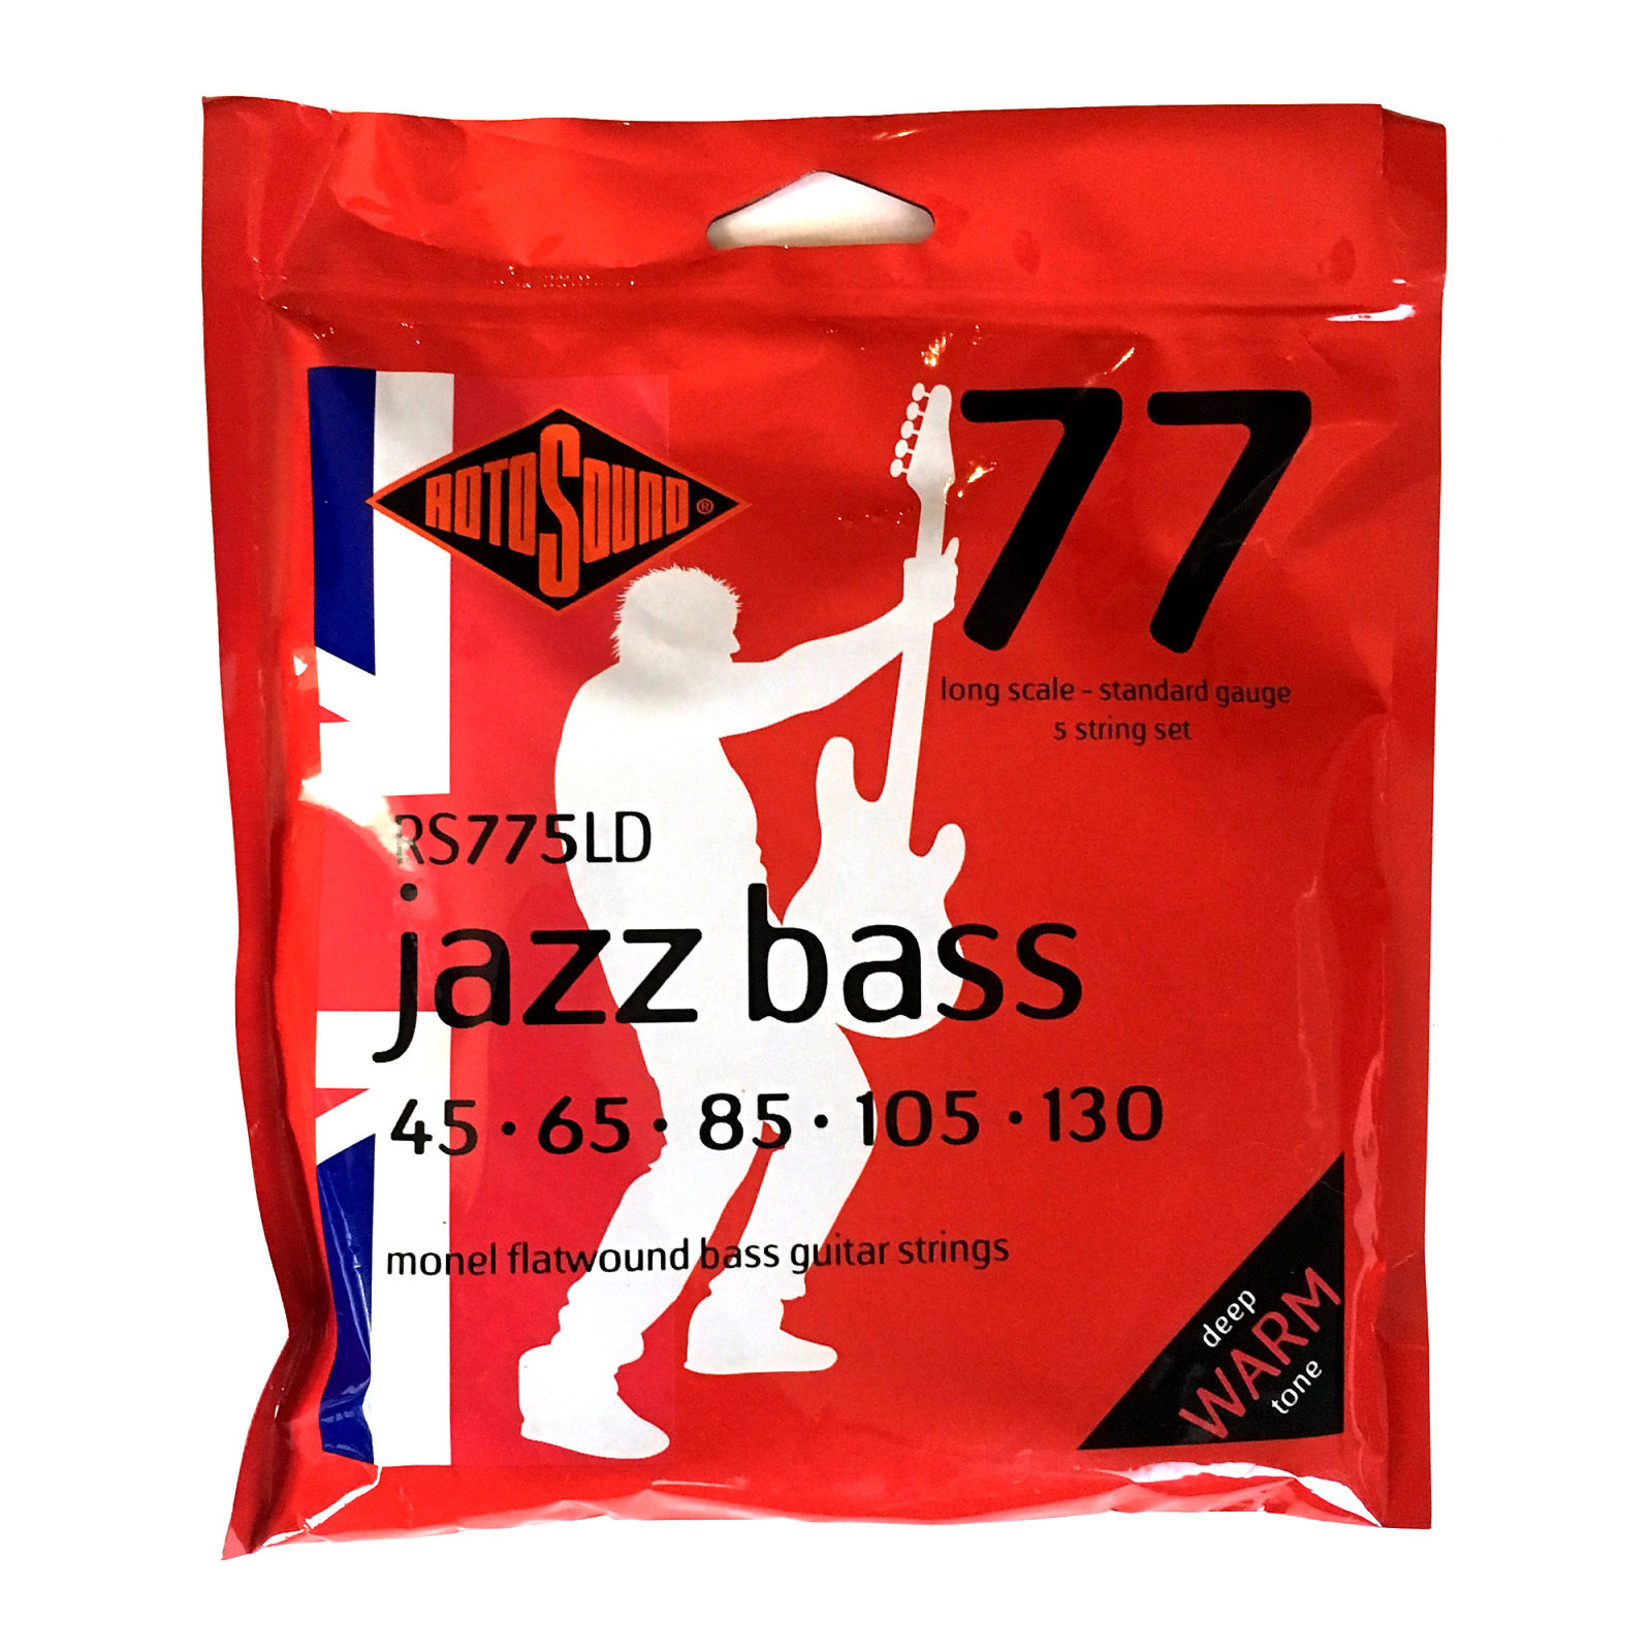 Rotosound Rotosound RS775LD Jazz 77 Bass Monel Flatwound 5-String Bass Guitar Strings (45-130)